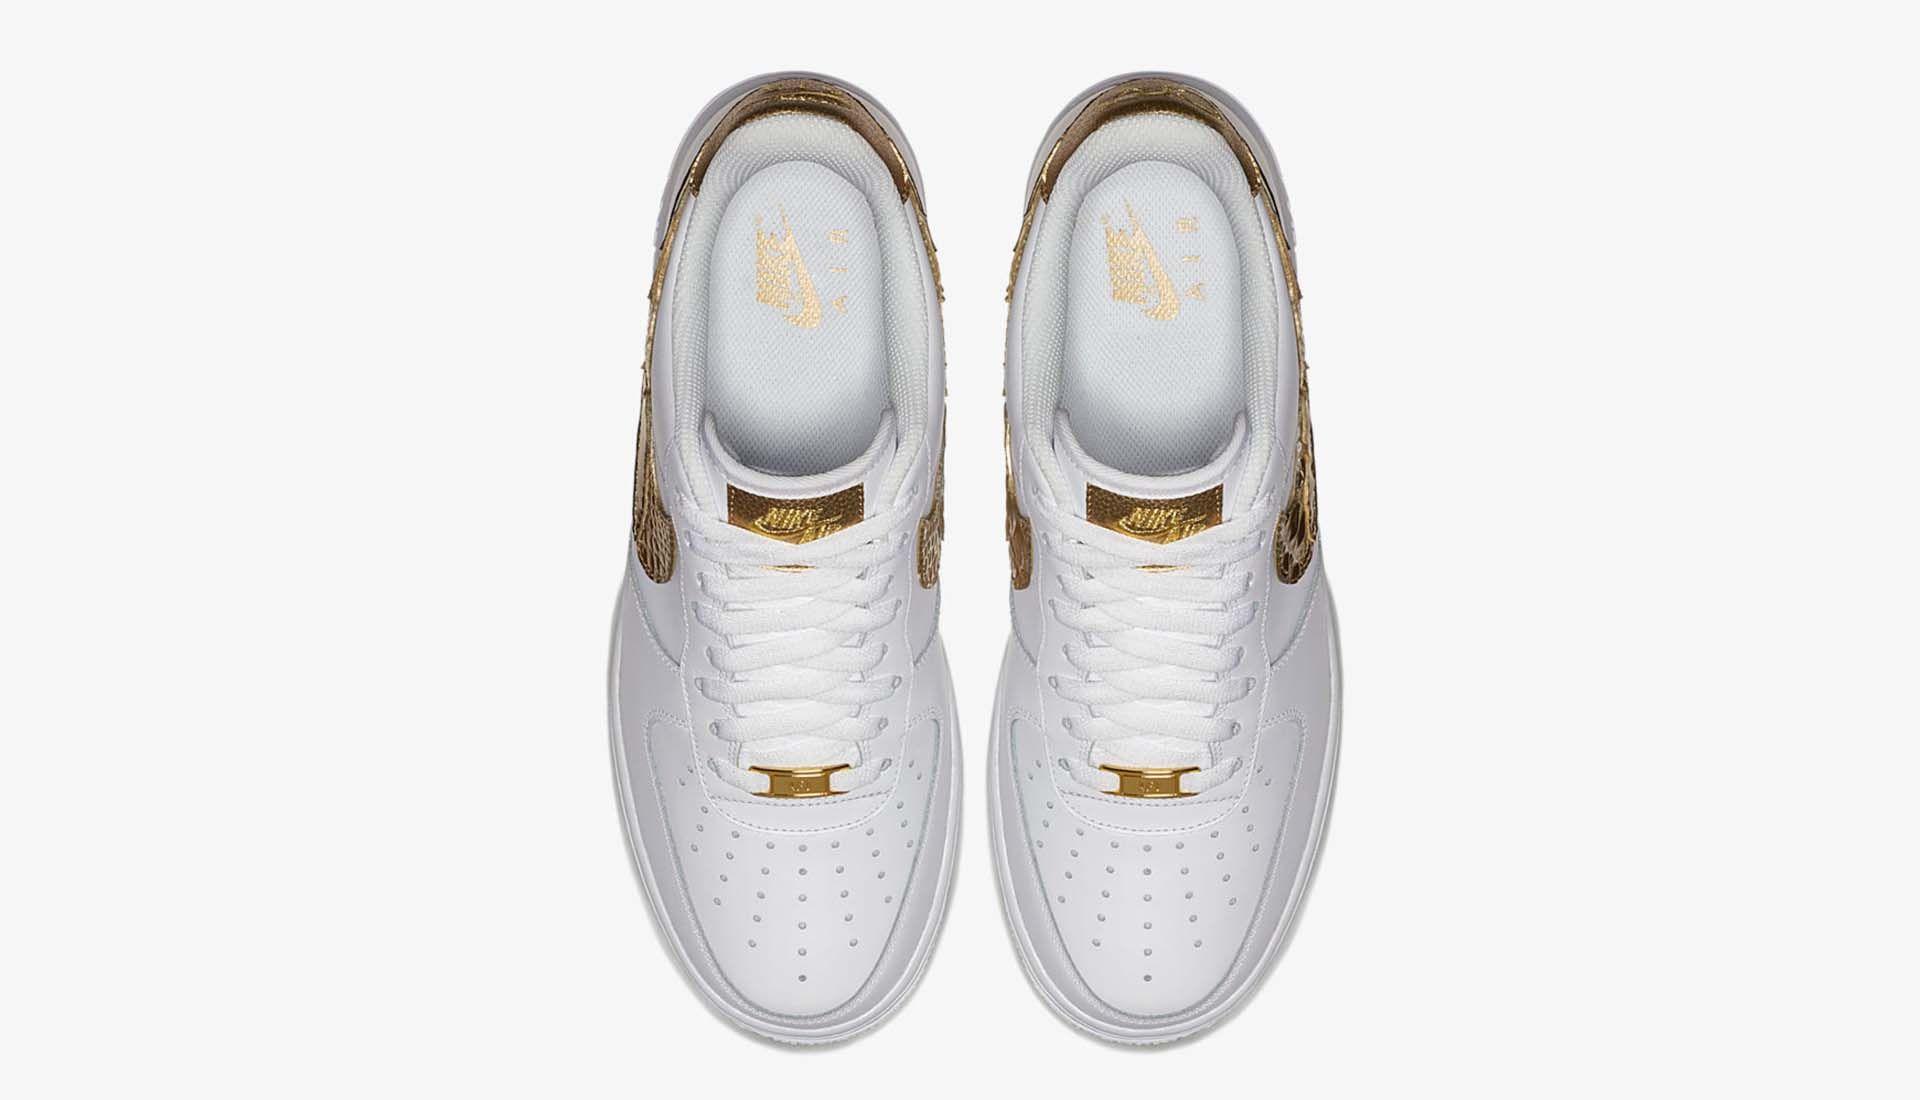 ac2b3d05cbab6 Nike Air Force 1 Low CR7